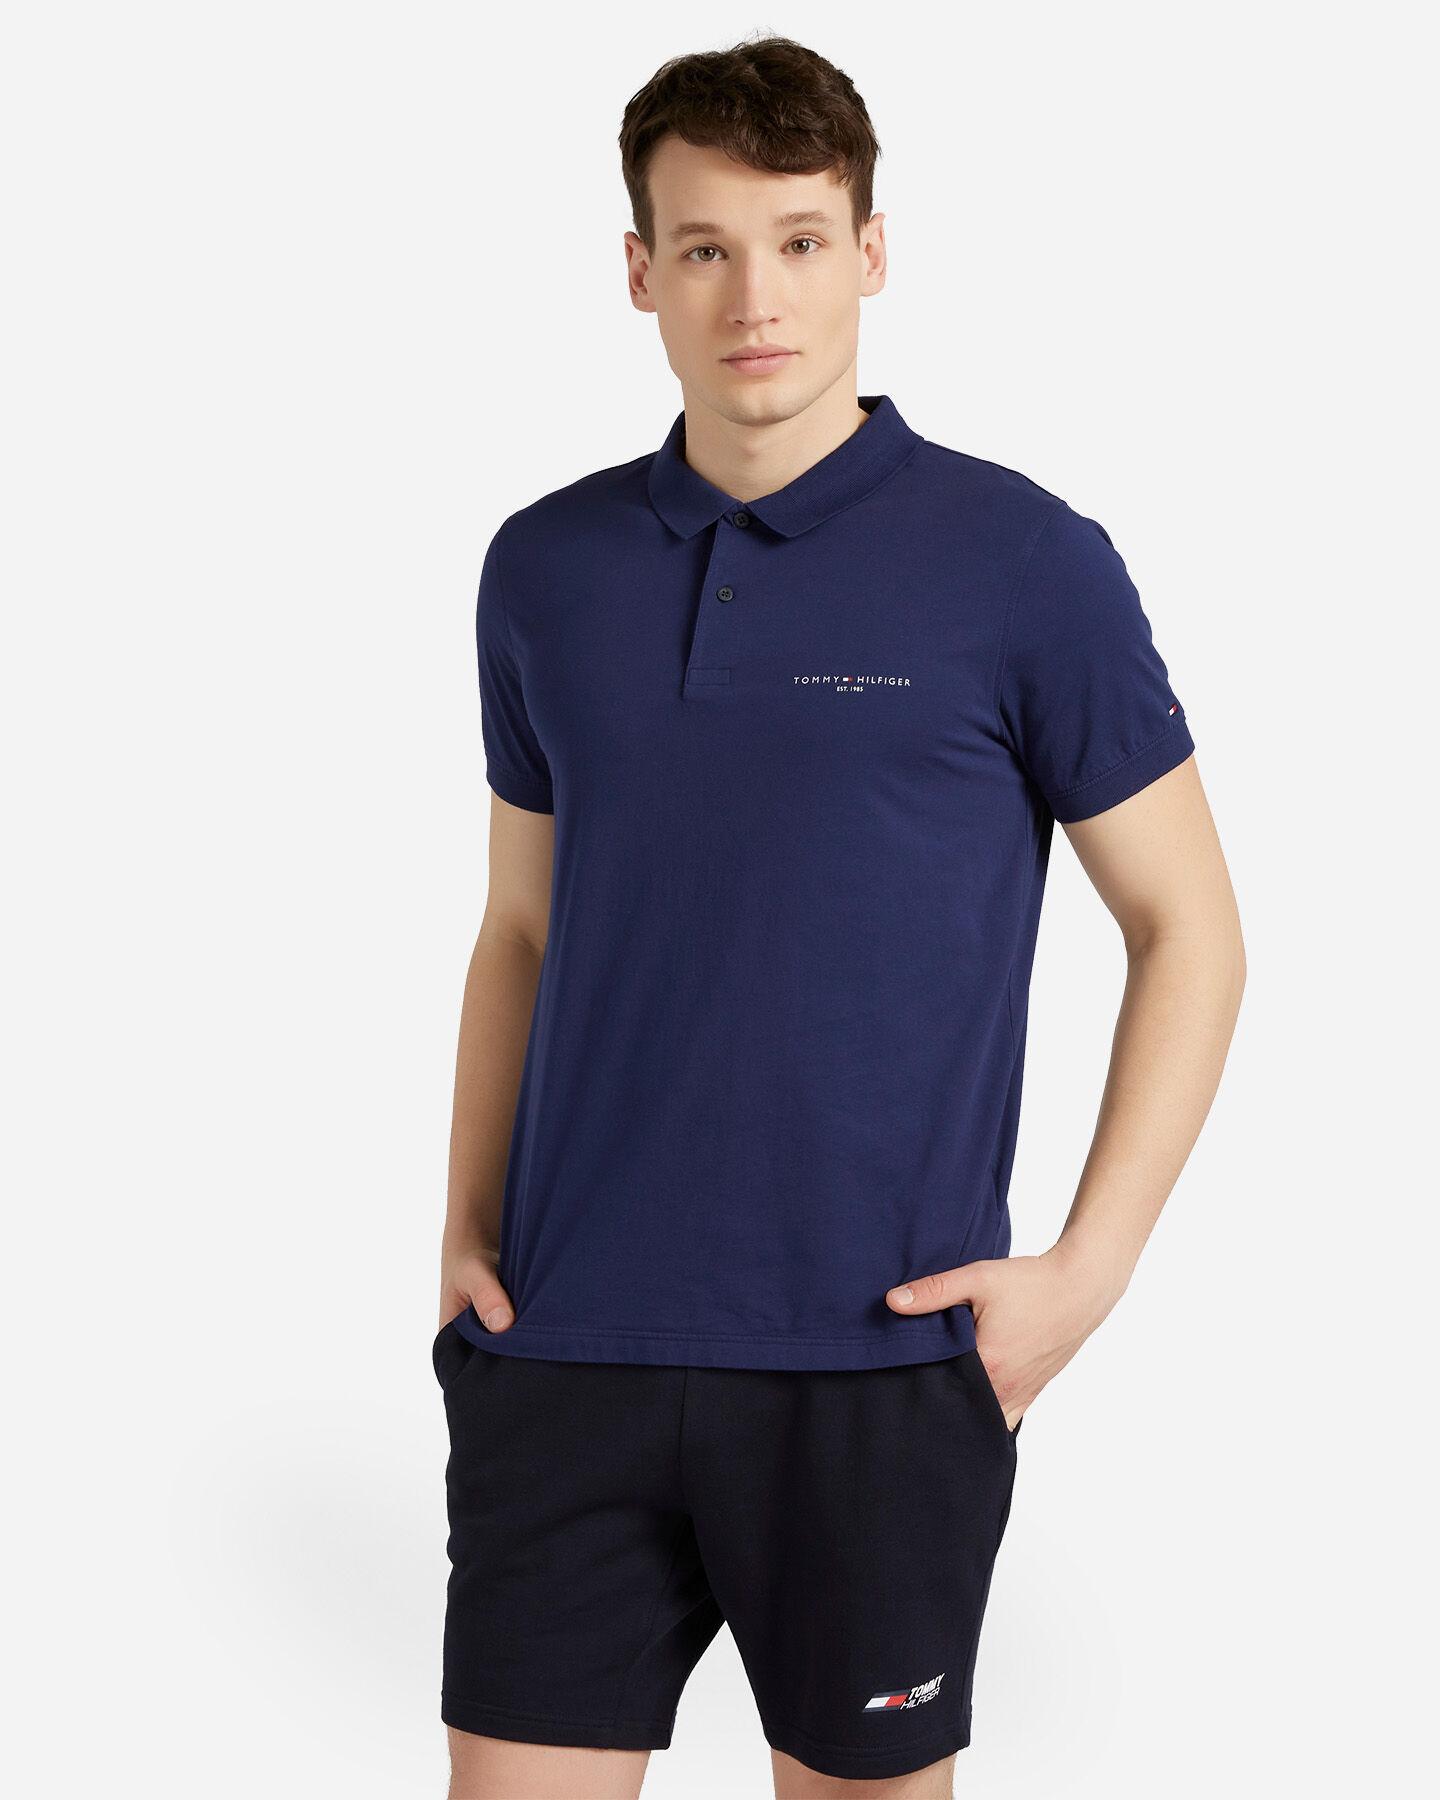 T-Shirt TOMMY HILFIGER CLEAN SLIM M S4089536 scatto 0